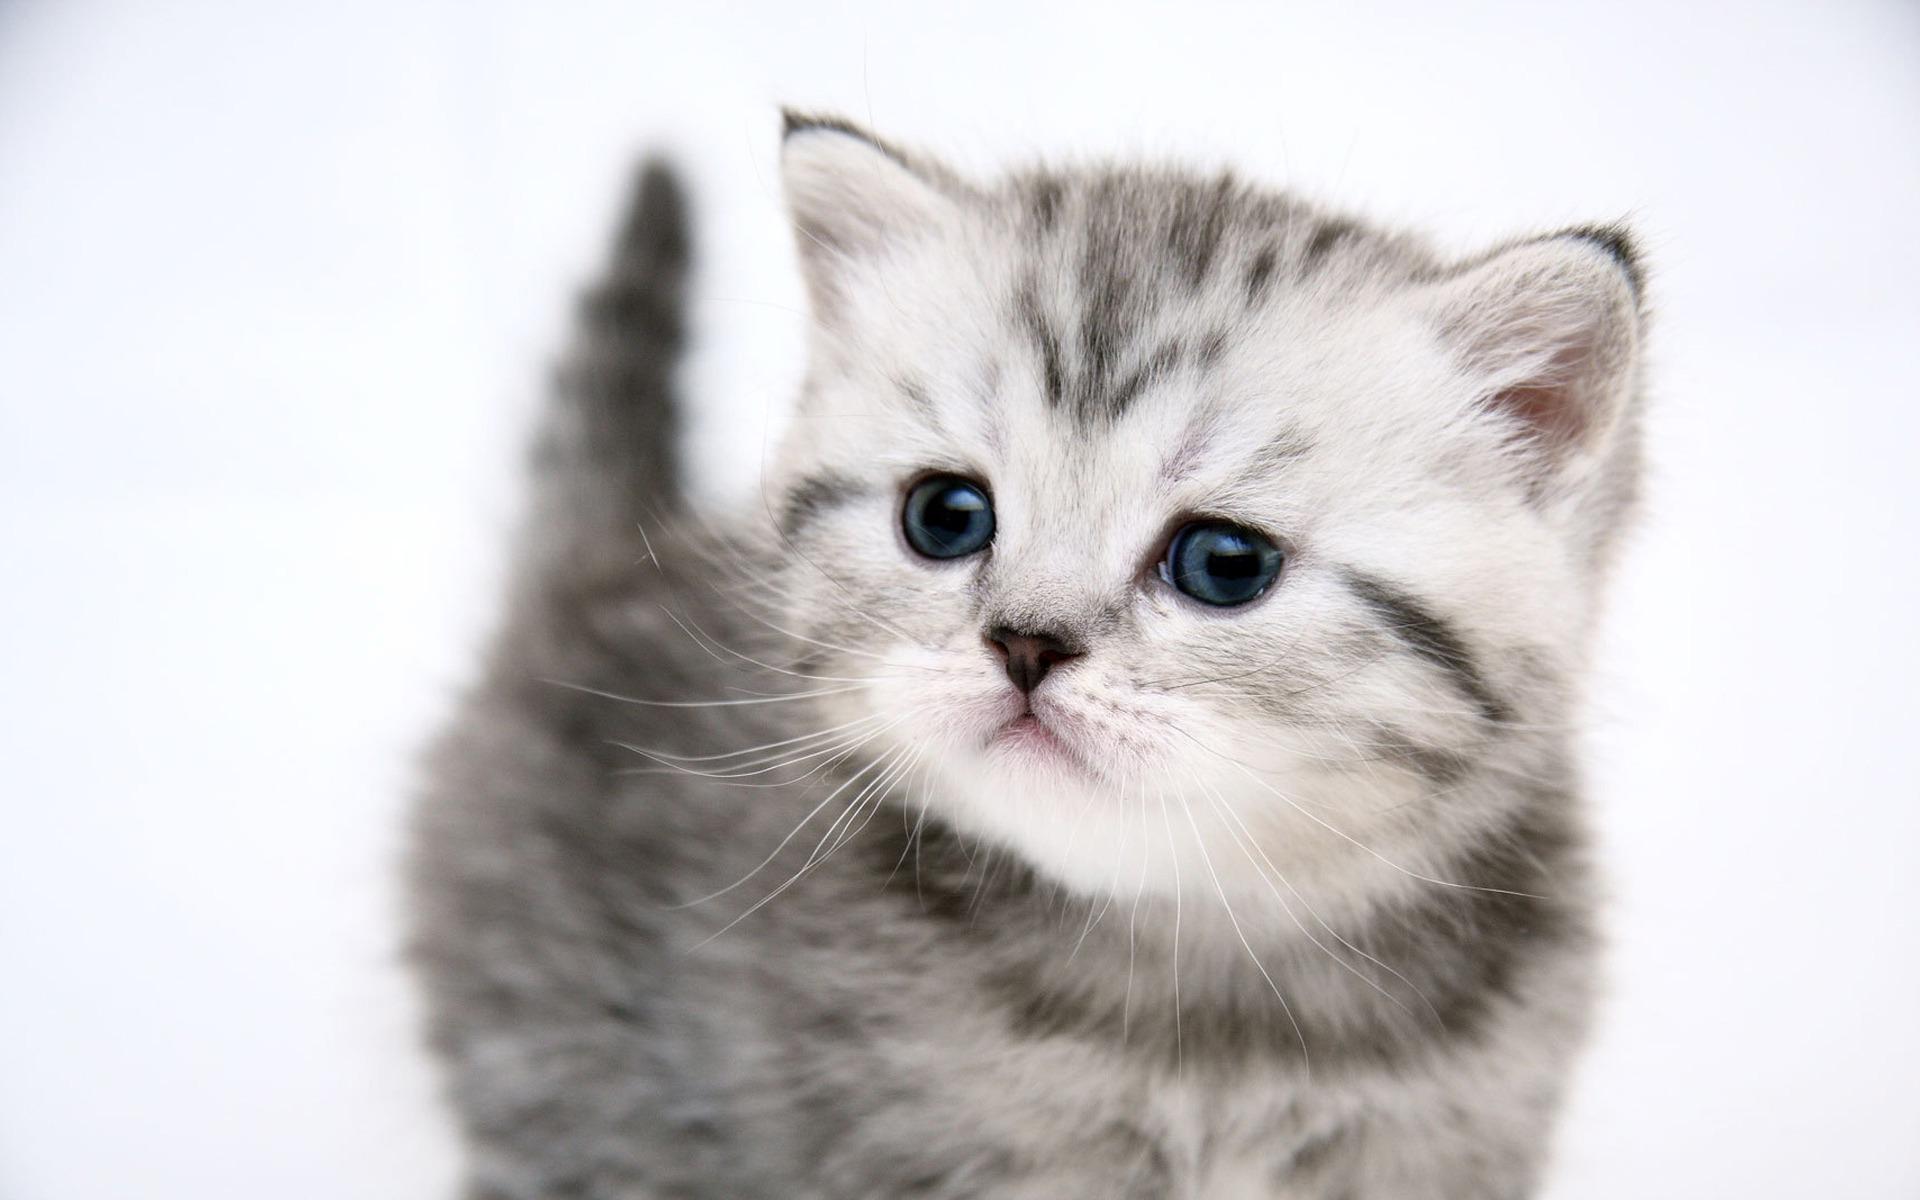 small-cute-kitty_wallpapers_24216_1920x1200.jpg